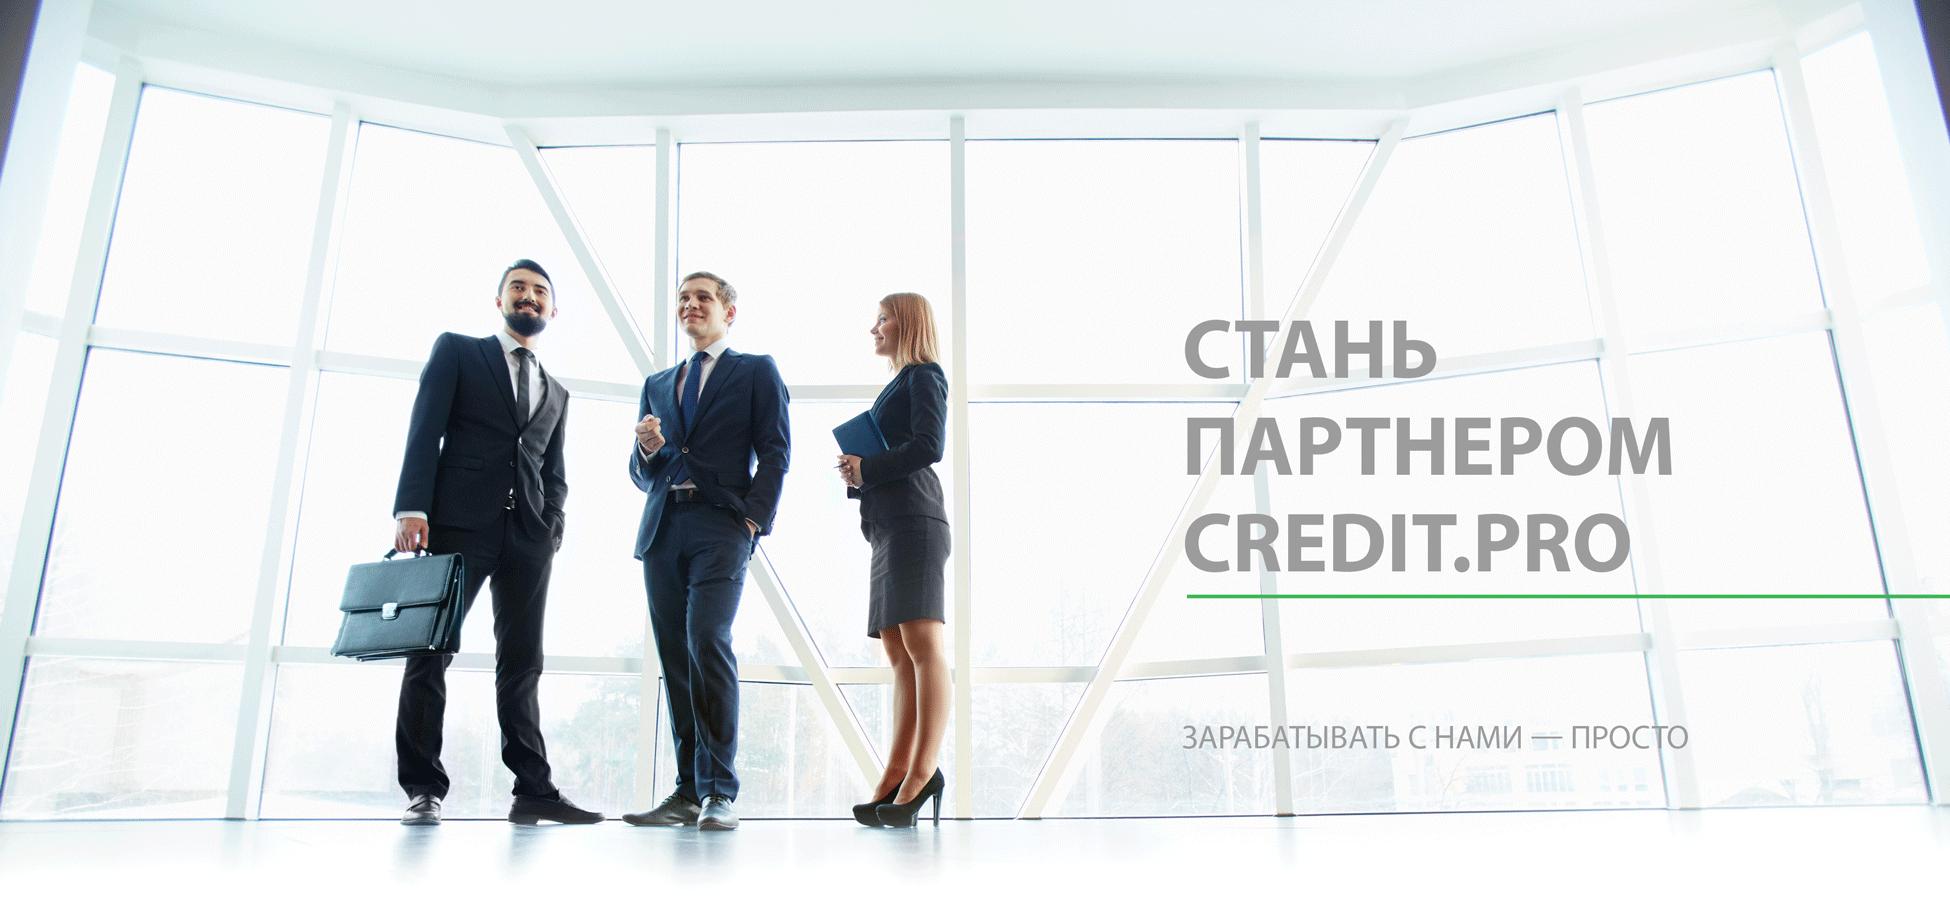 проверяют ли место работы при оформлении кредита